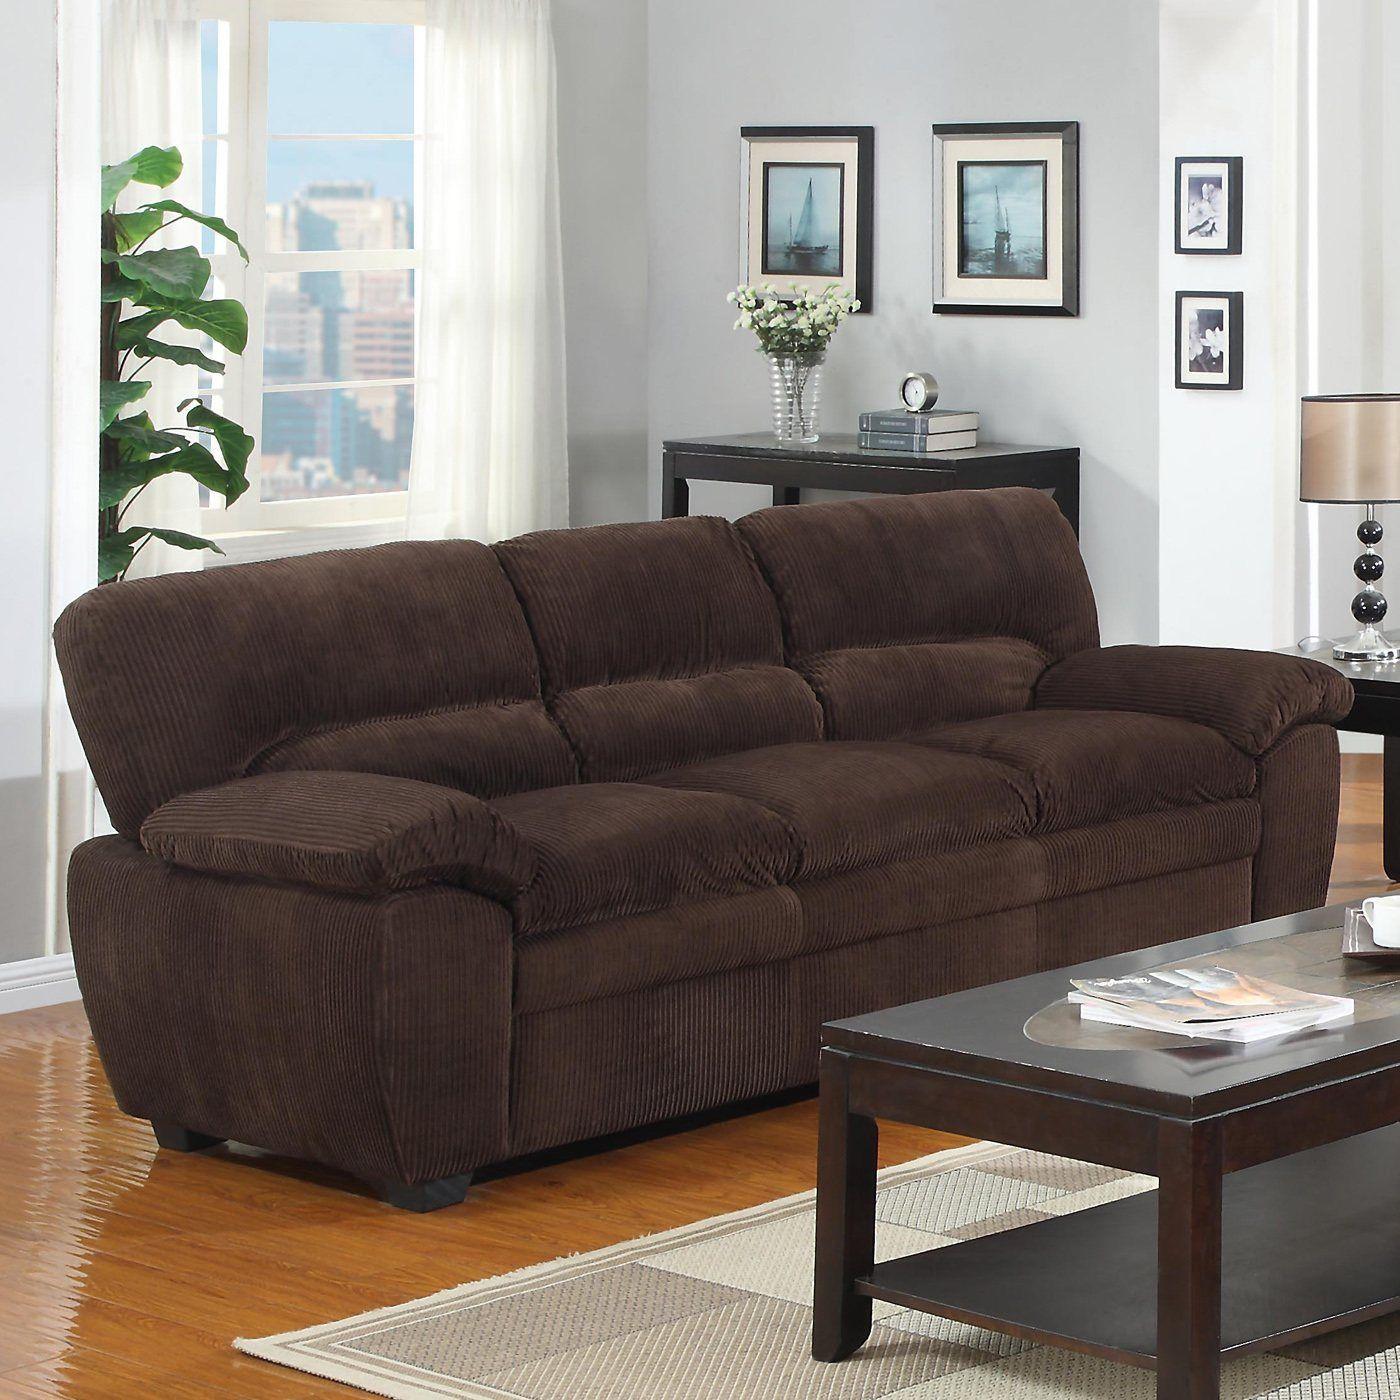 Home Decor Imports: Home Décor Import L2125-01 Full Length Sofa